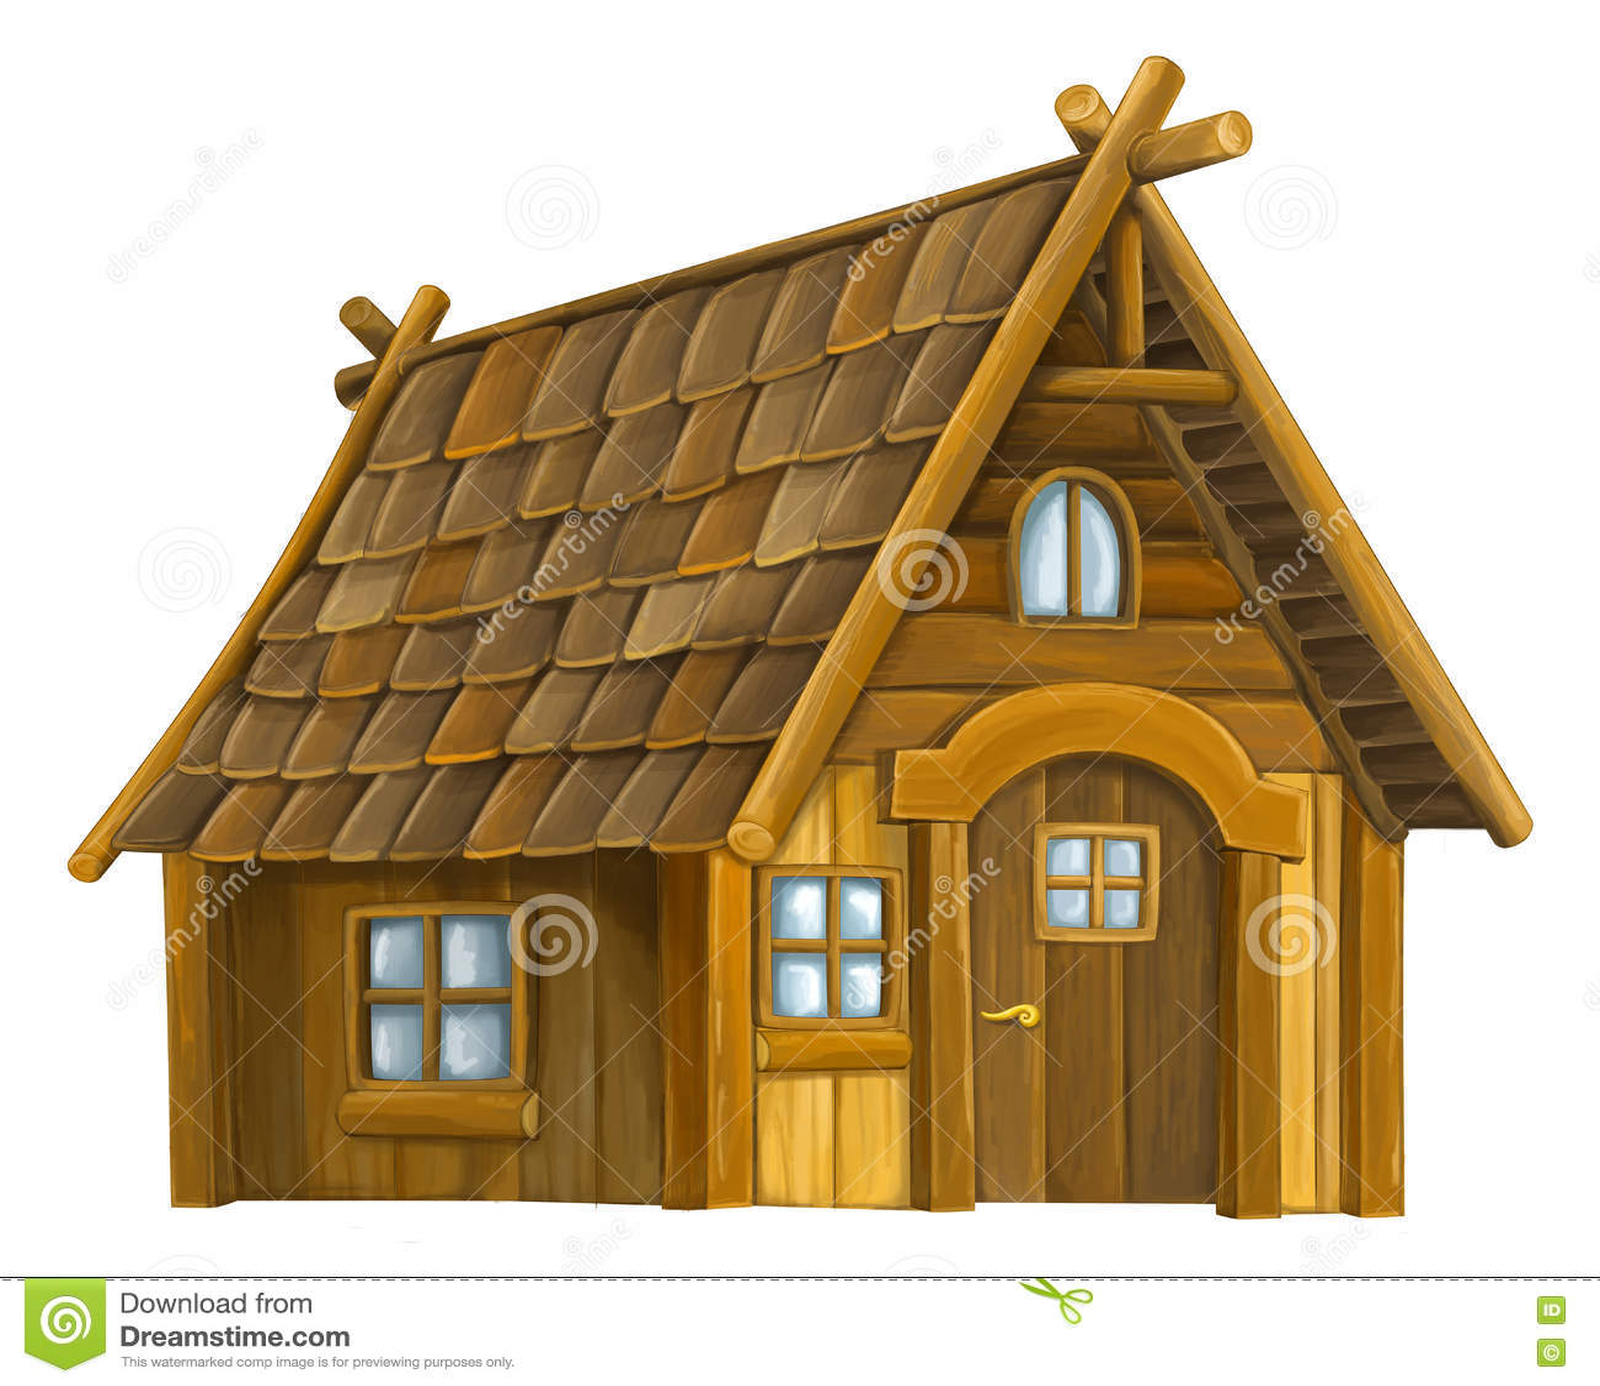 Old Cartoon Wooden House - Stock Illustration - Image: 71911463